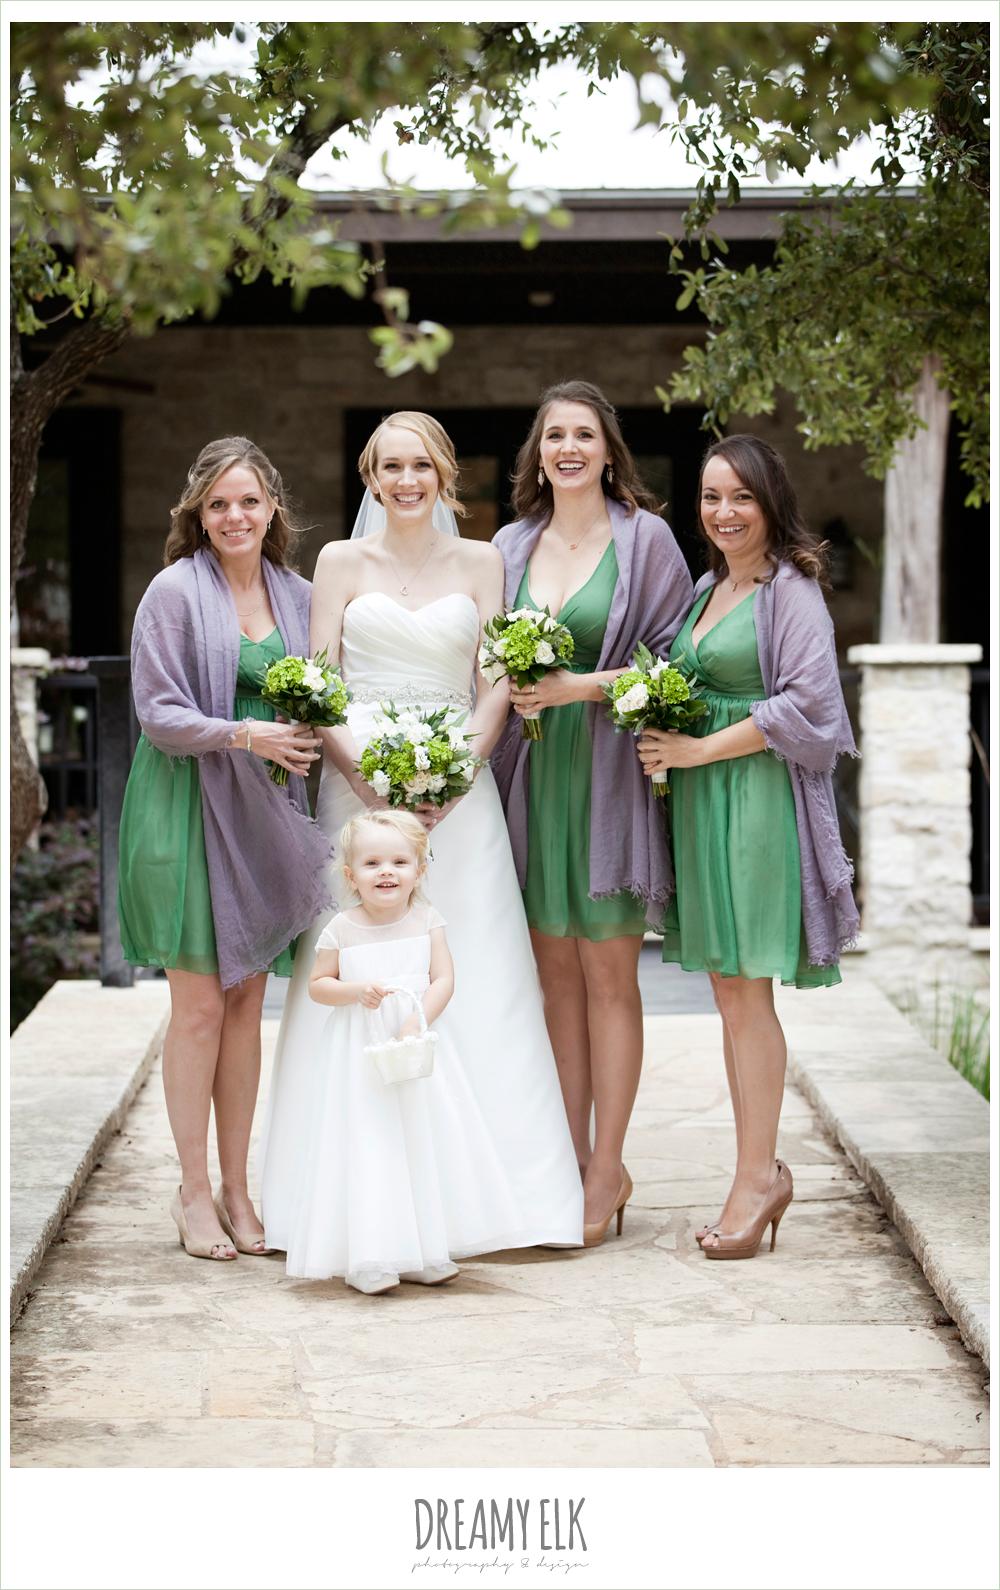 sweetheart strapless wedding dress, short green bridesmaids dresses, purple shawls, winter vineyard wedding, dreamy elk photography and design